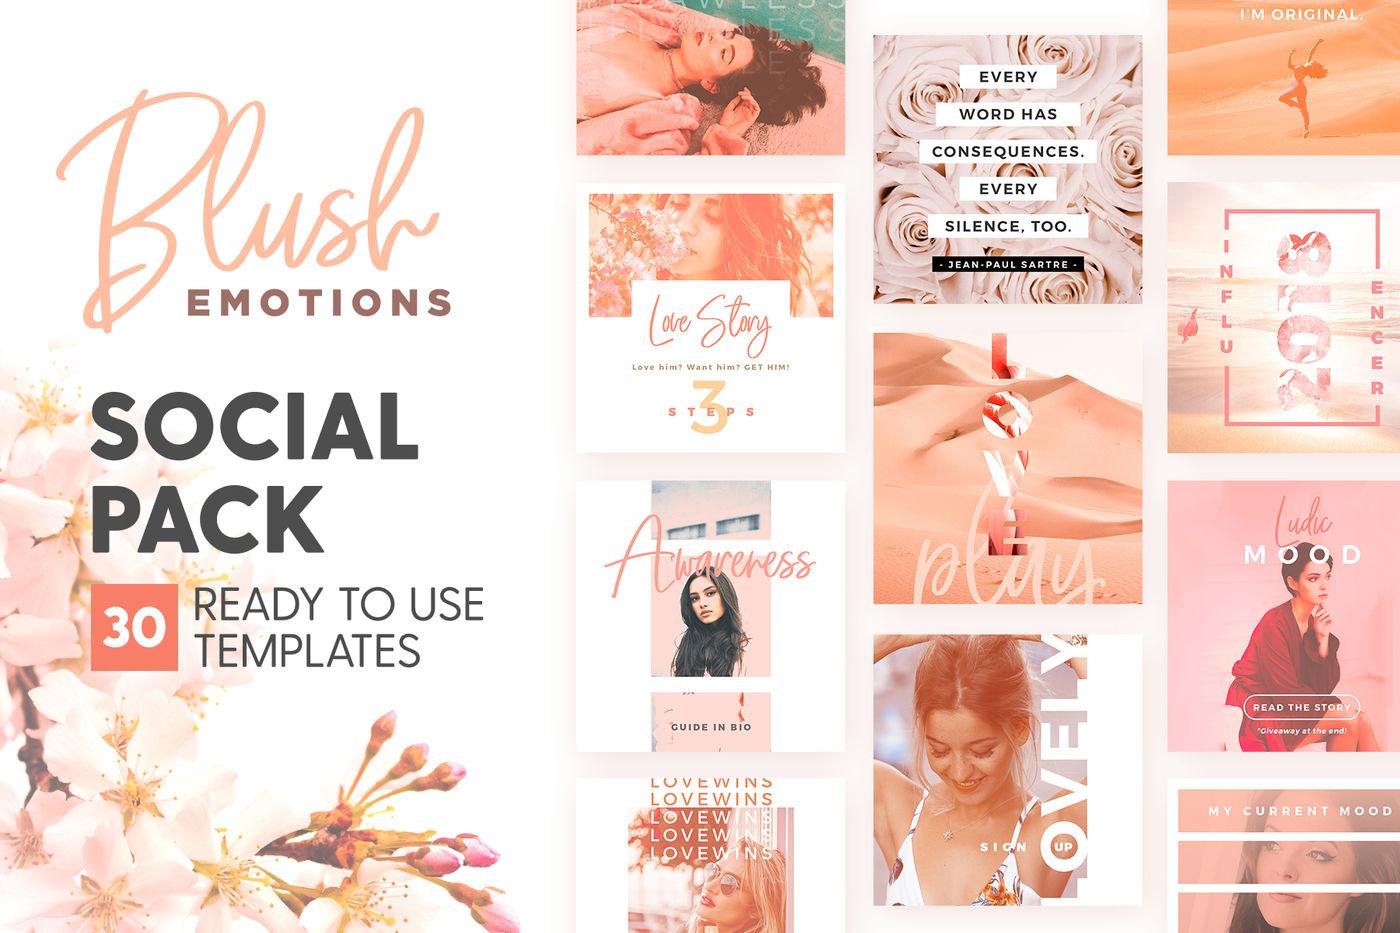 Blush Emotions Social Pack By The Wedding Shop Thehungryjpeg Com